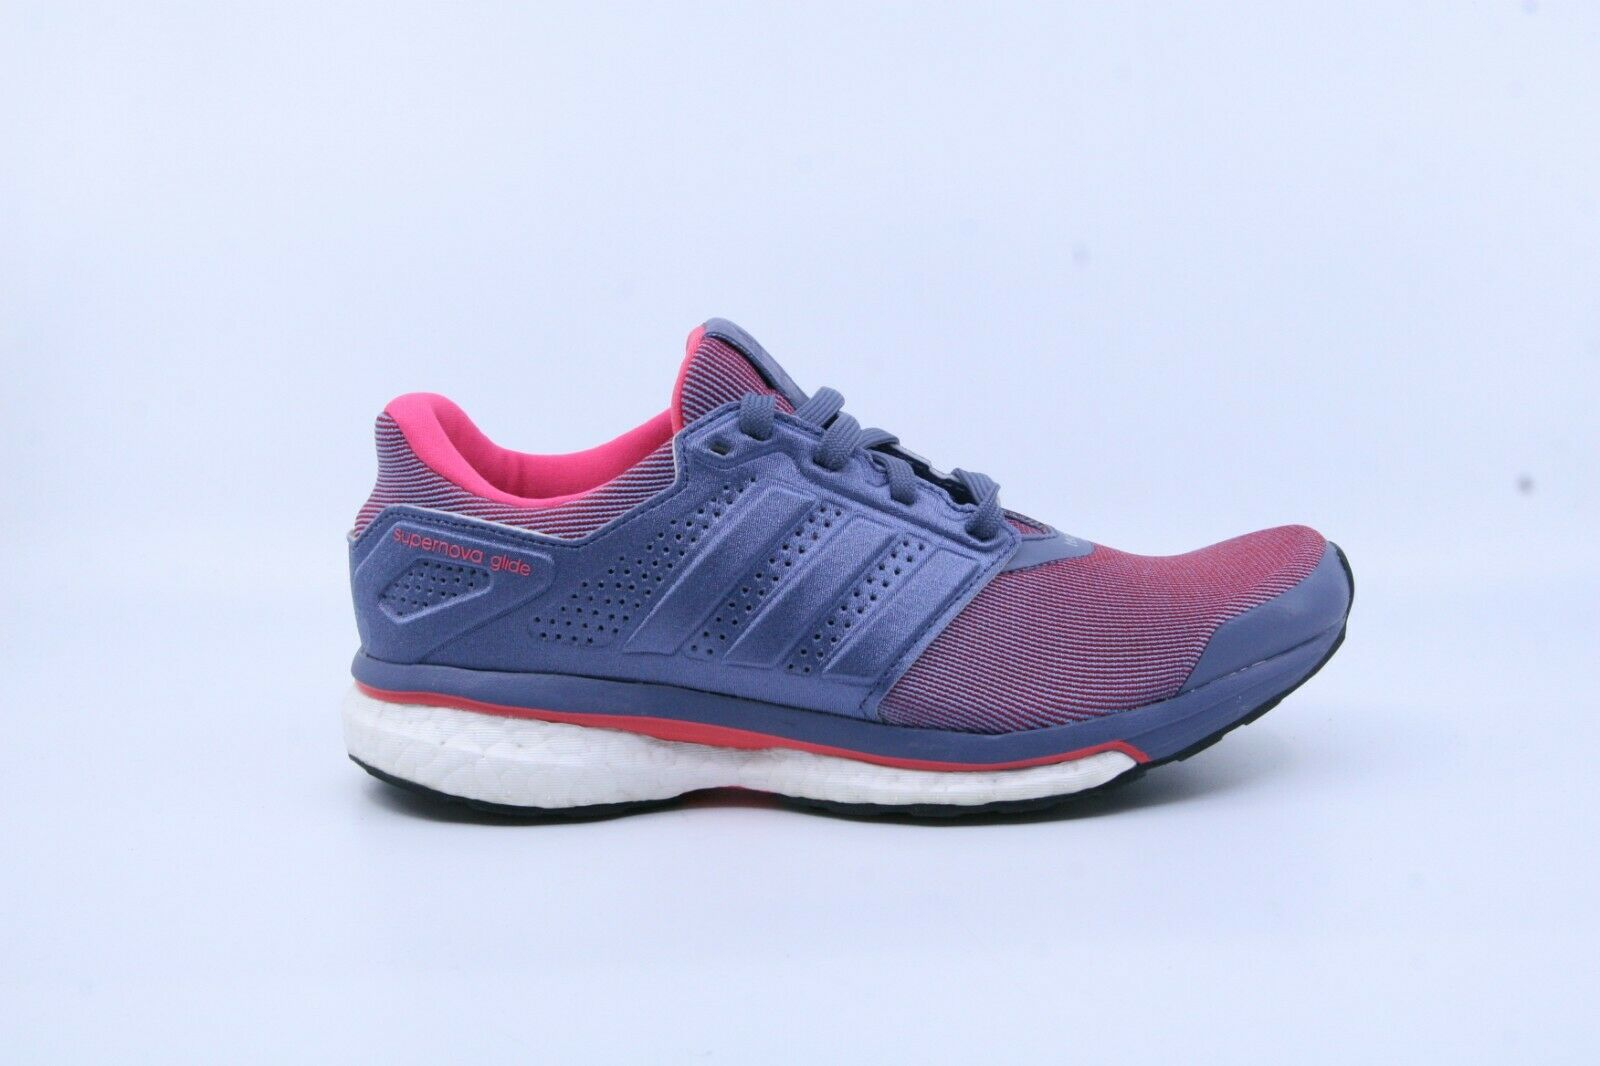 Adidas S80275 Mujer Supernova Glide 8 Tenis Para Correr Púrpura Rojo US 6